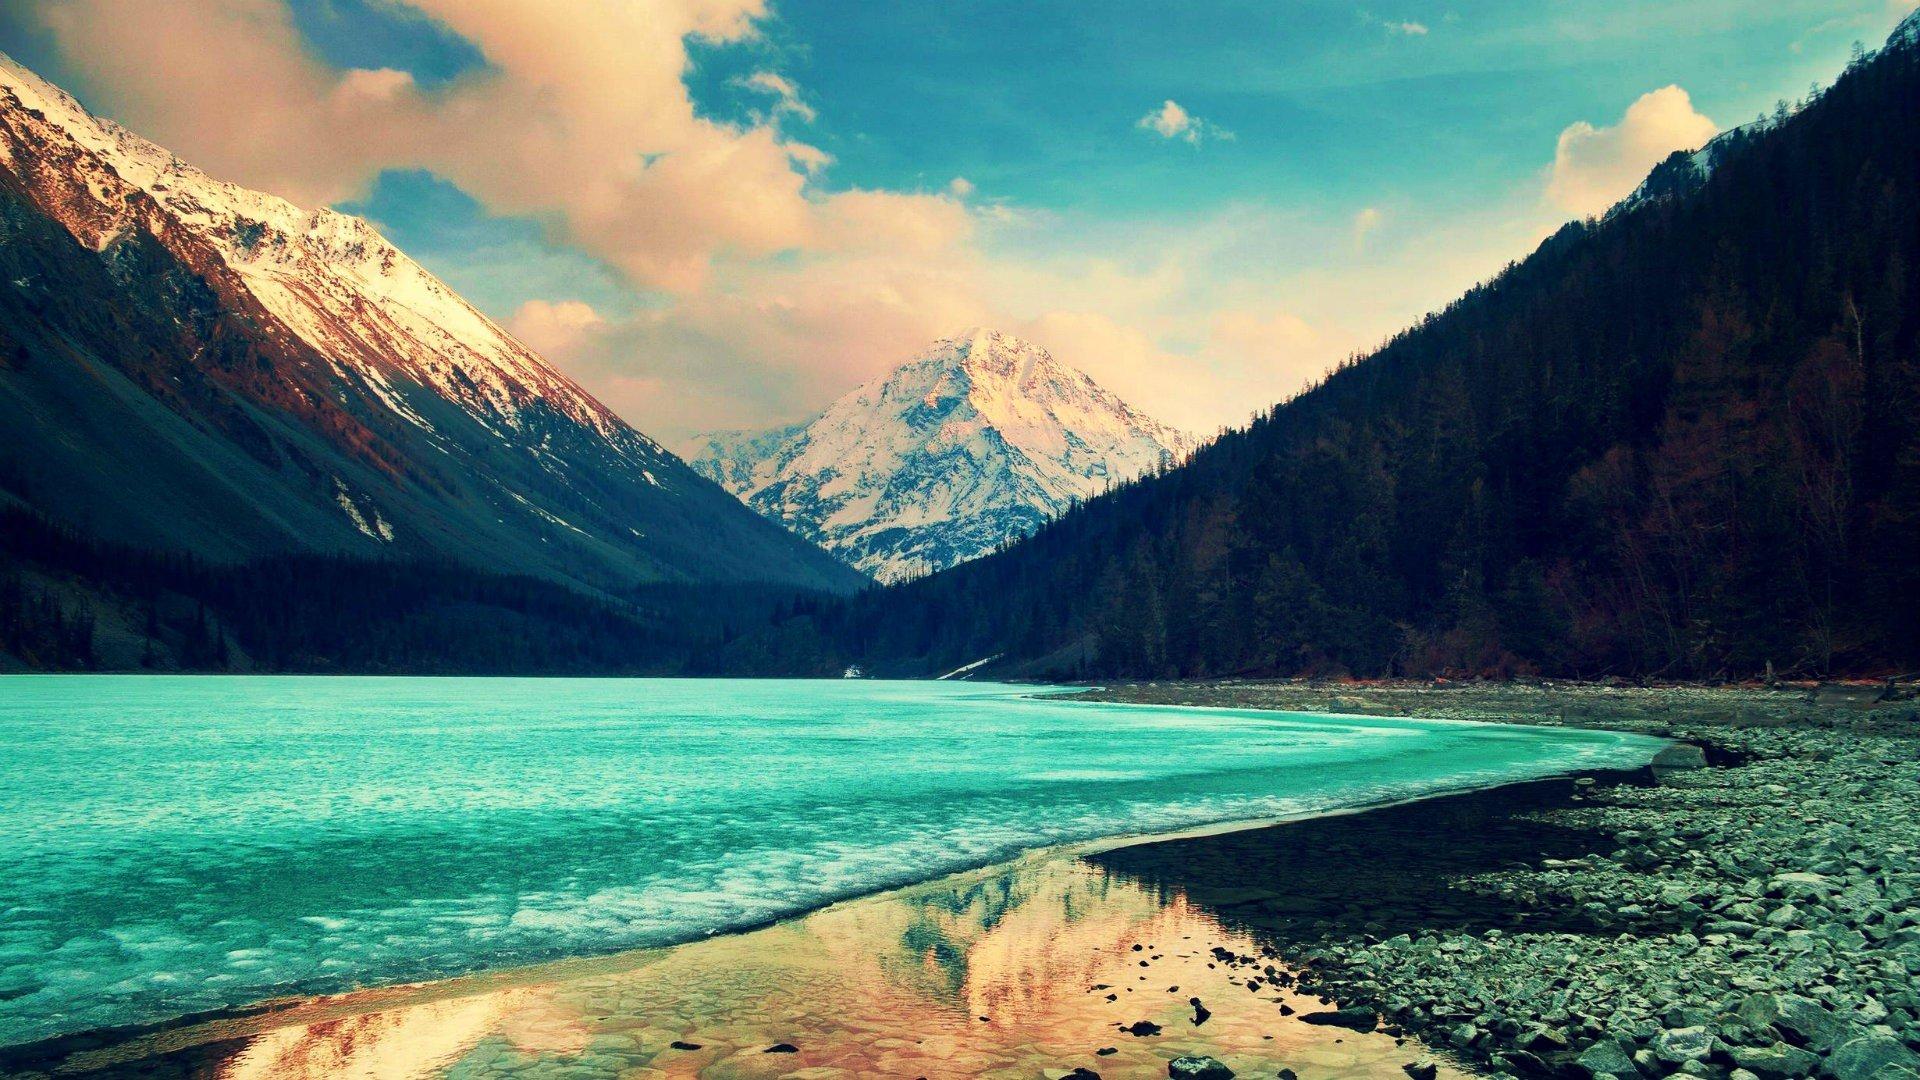 Nature_mountain_forest_landscape_fog_lake_ultrahd_4k_wallpaper on Beautiful Landscape Hd Wallpaper 1920x1080